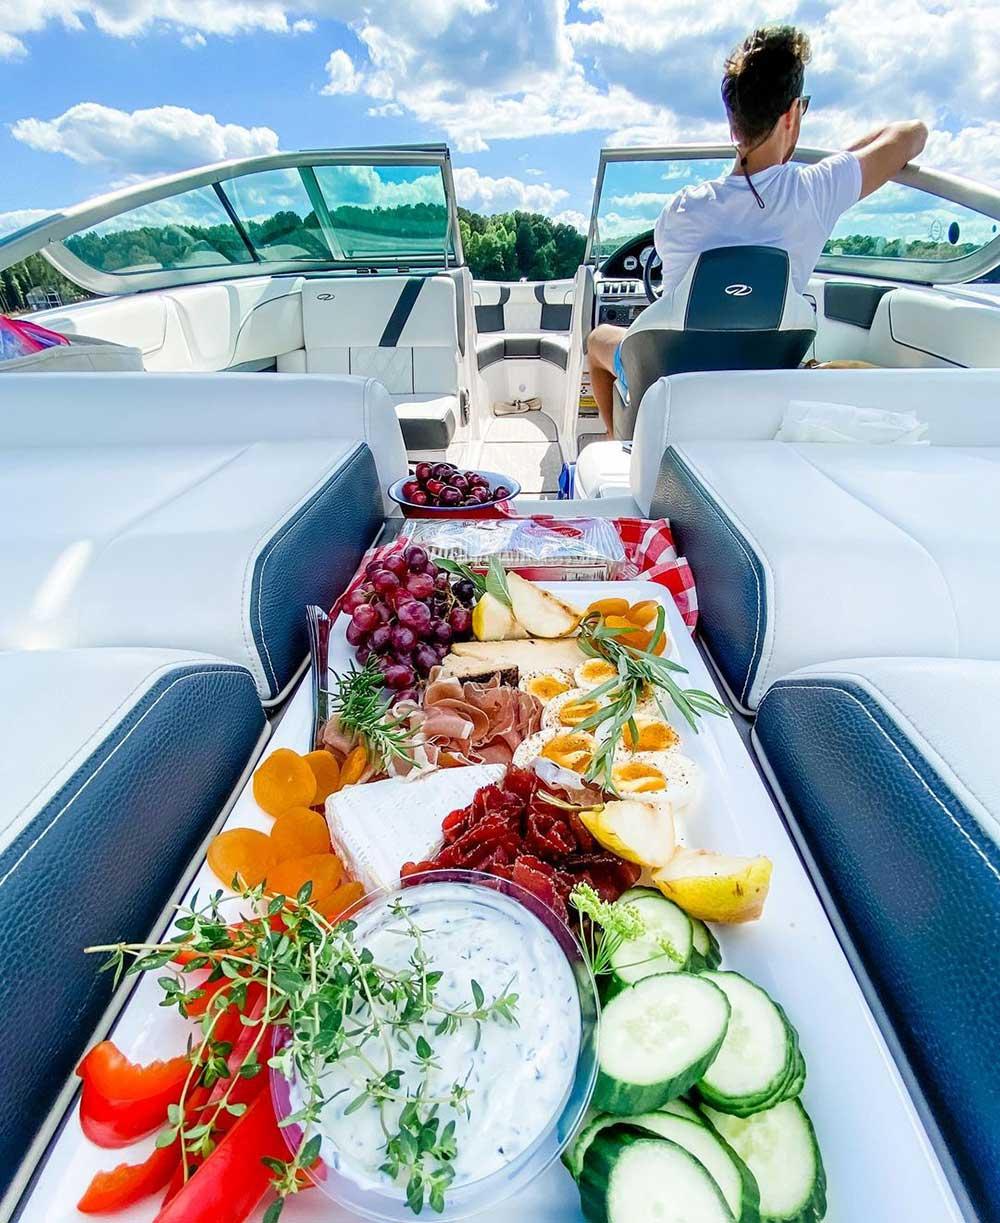 boating fresh fruits and veggies